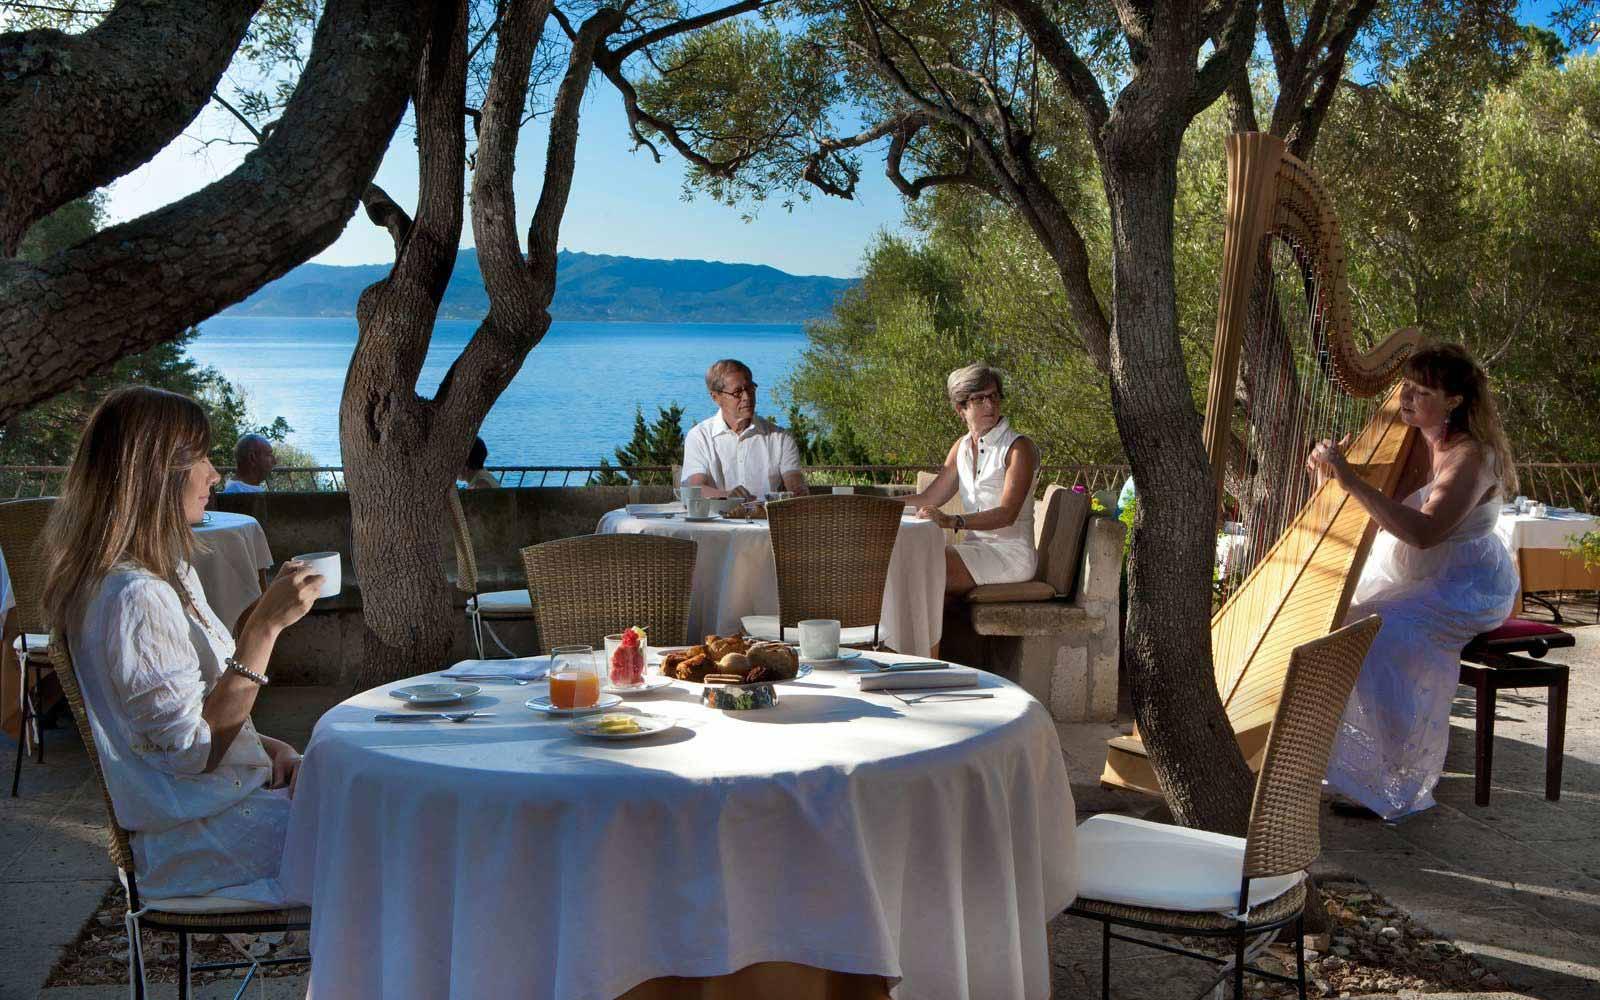 Breakfast at Olivastri at Hotel Capo D'Orso Thalasso & Spa